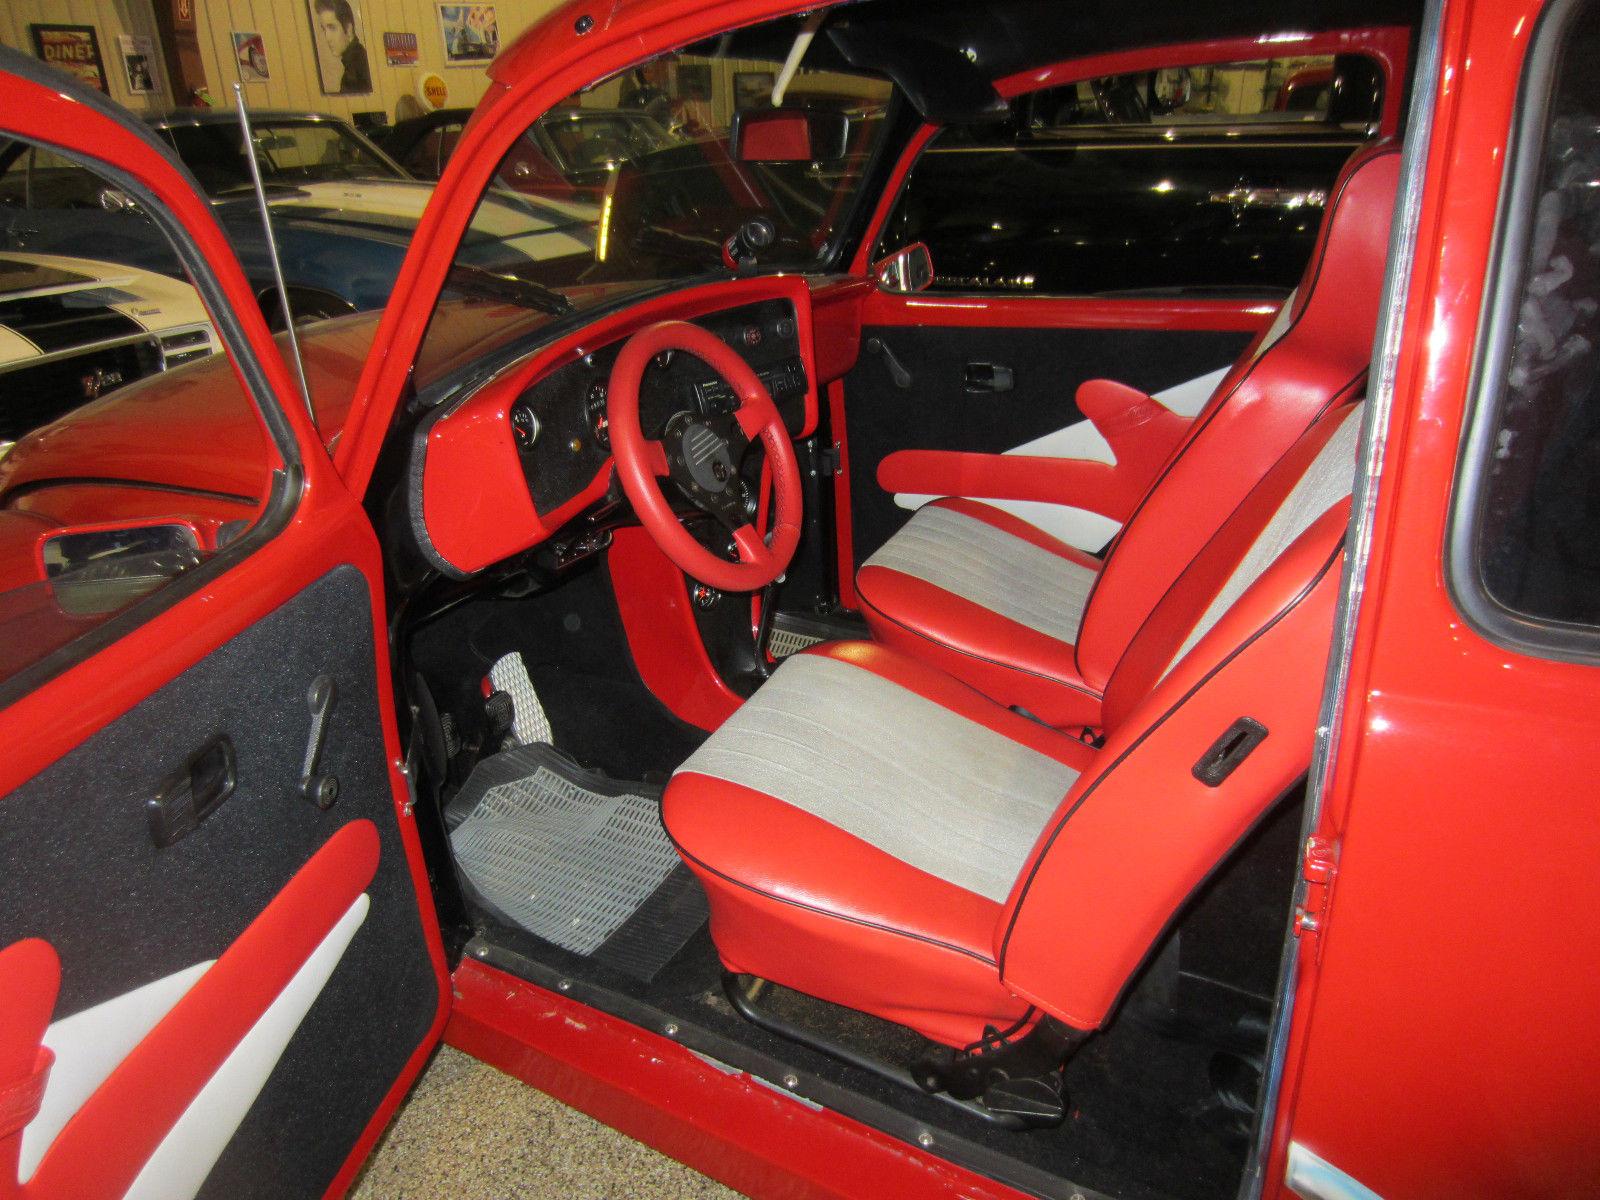 custom classic show muesuem quality baja bug  restored classic volkswagen beetle classic